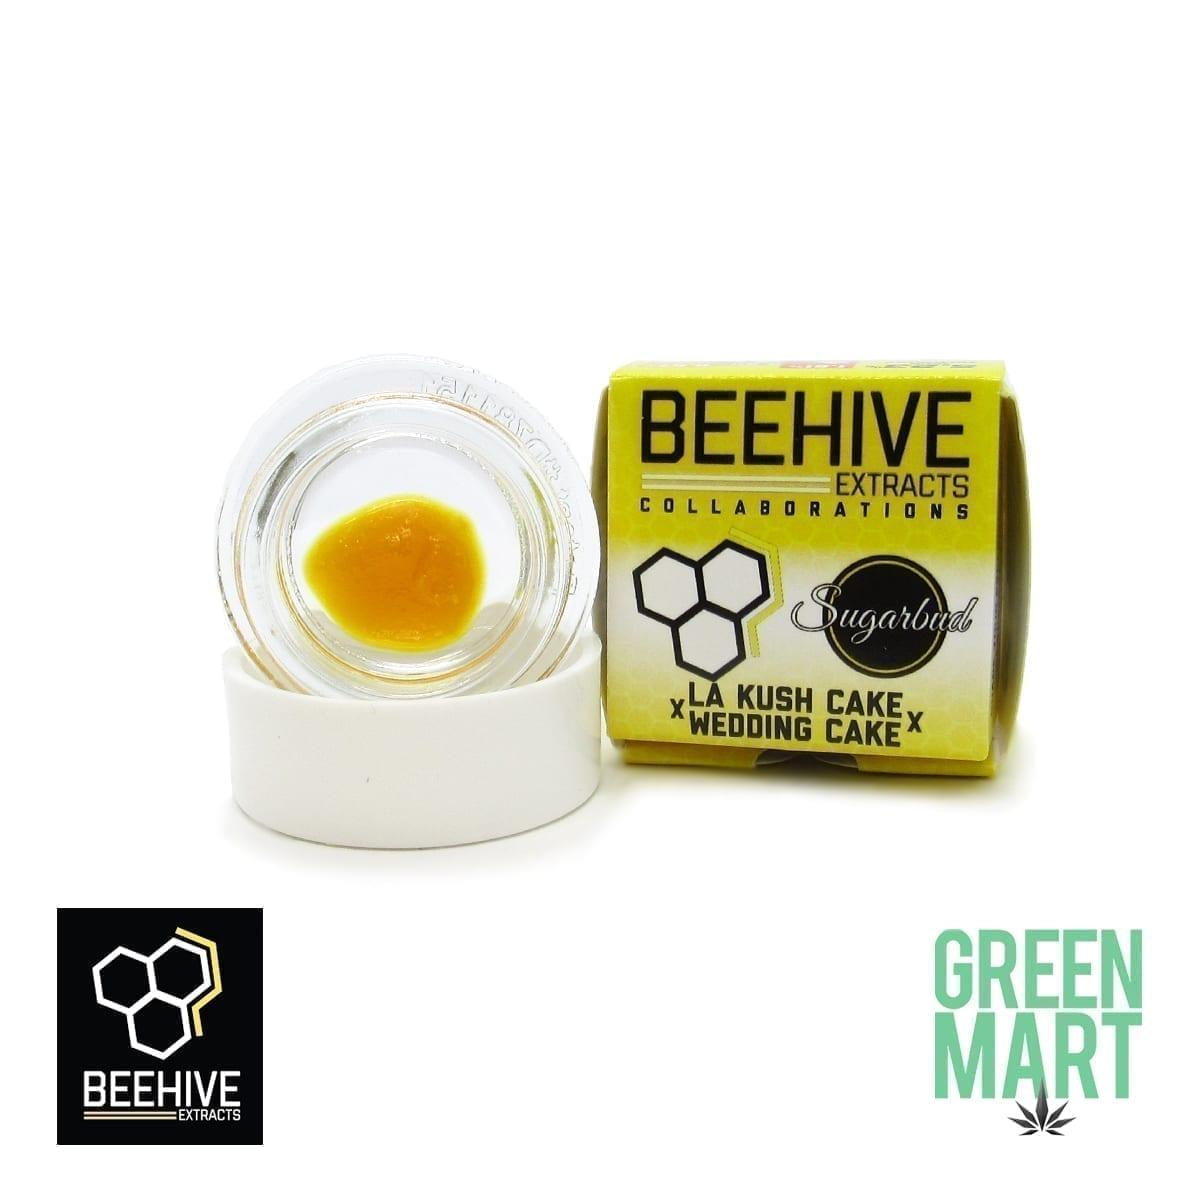 Bee Hive Extracts - LA Kush Cake X Wedding Cake